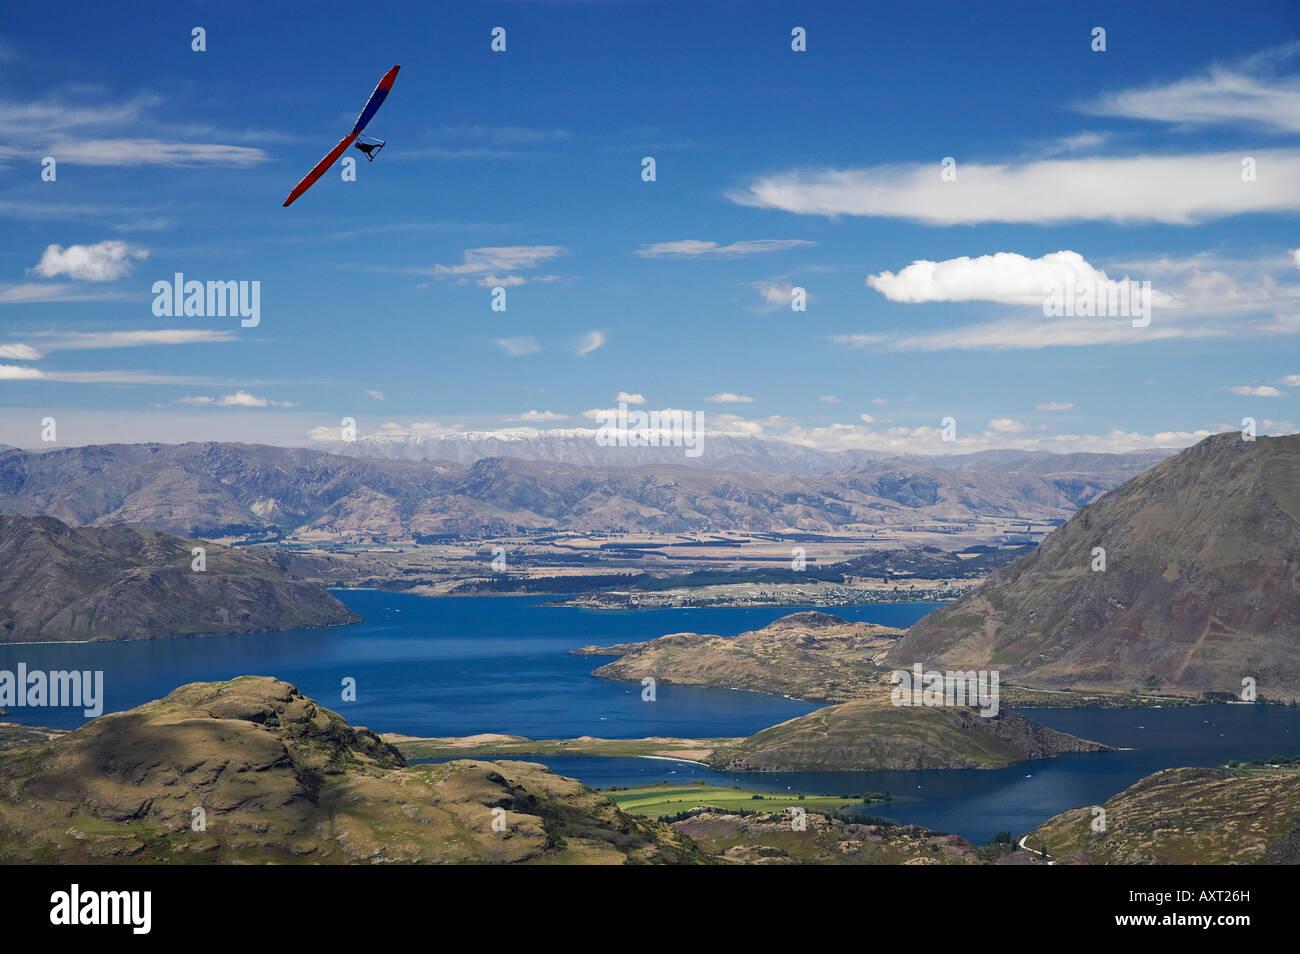 Hang Glider above Lake Wanaka South Island New Zealand - Stock Image